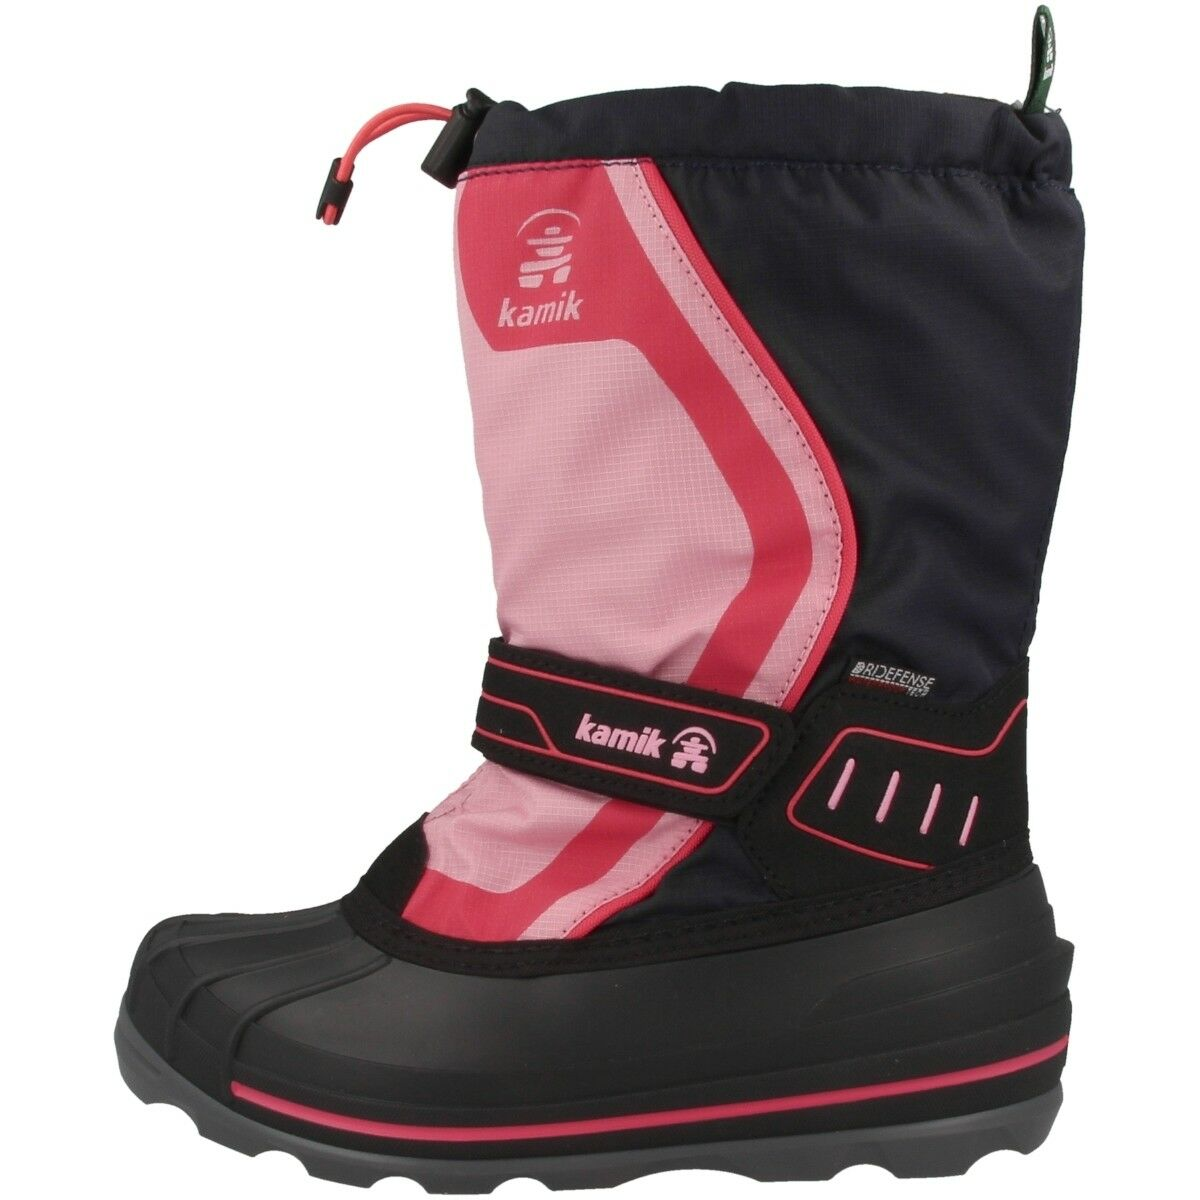 Kamik Snowcoast4 Kinder Winterstiefel Stiefel Stiefel Schuhe navy pink NK4852-NAV